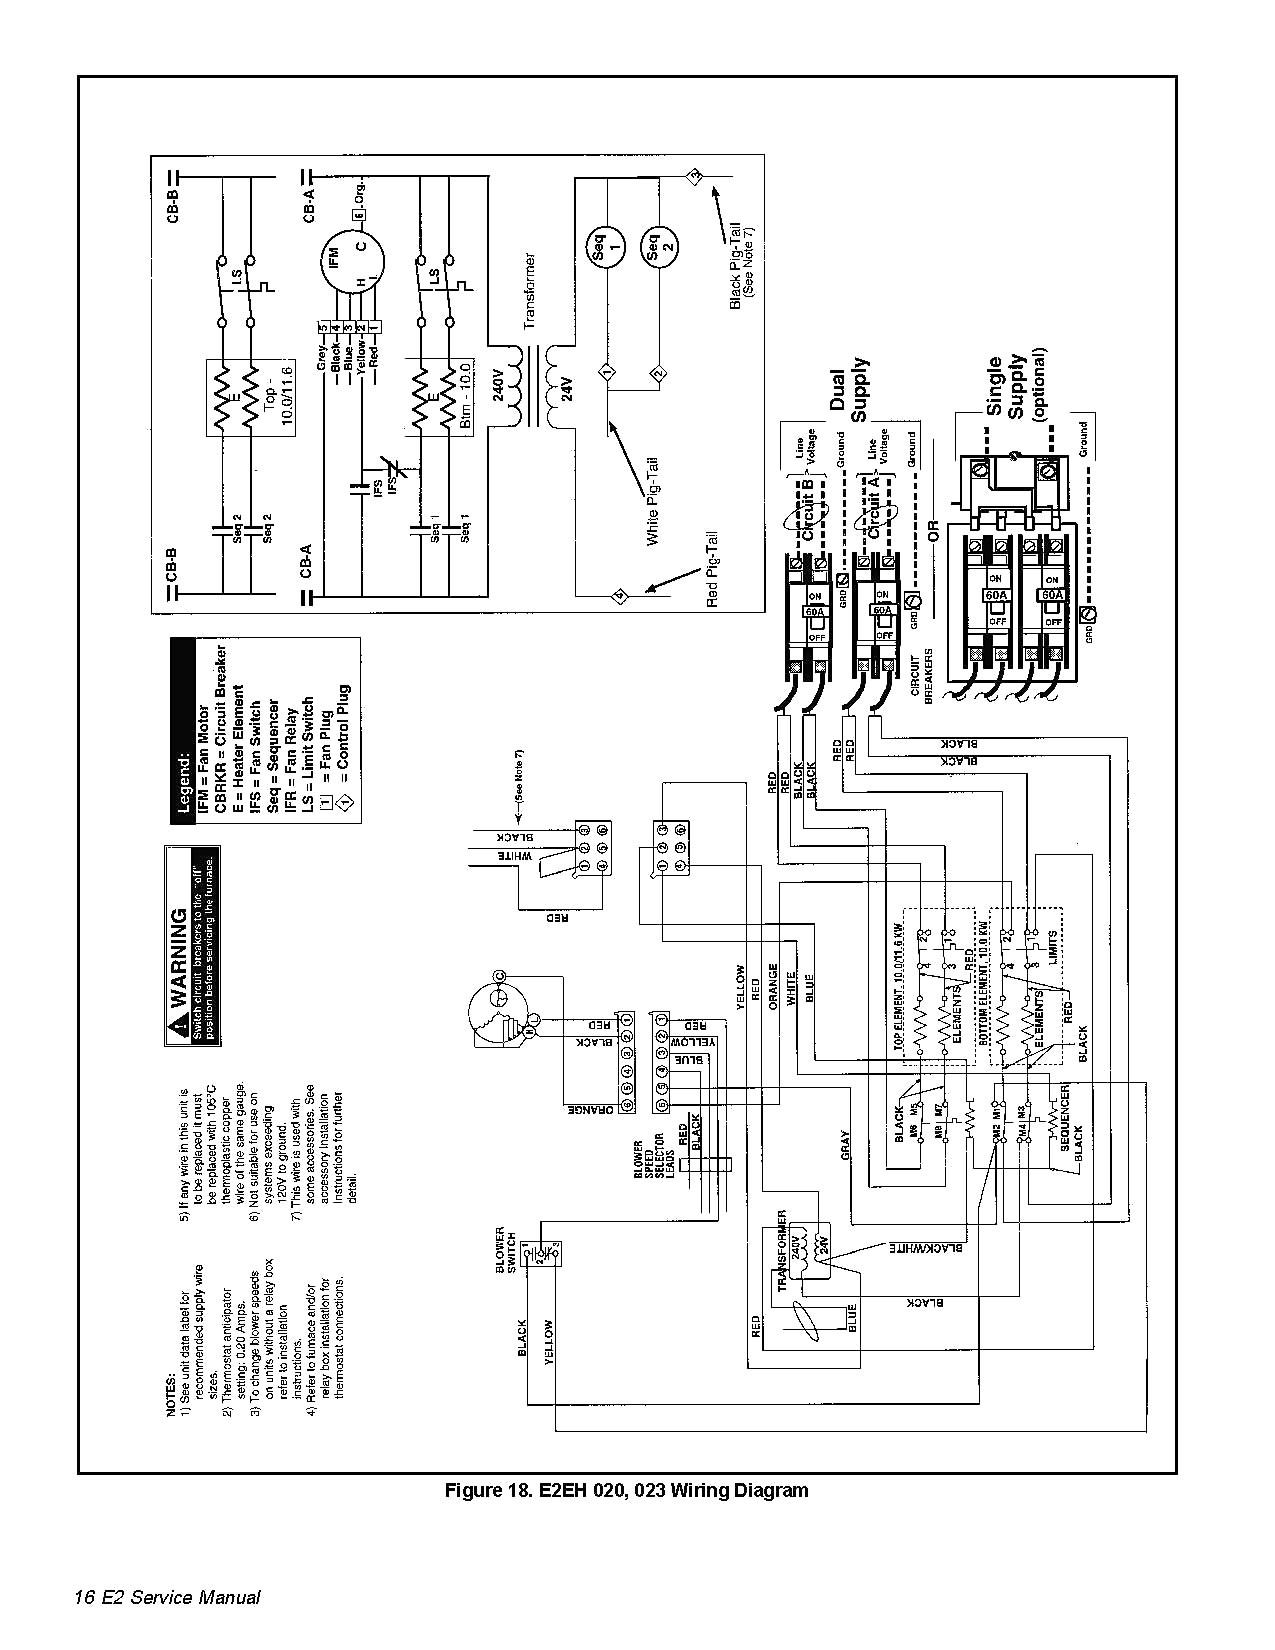 Intertherm Electric Furnace Wiring Diagram For Nordyne Heat Pump